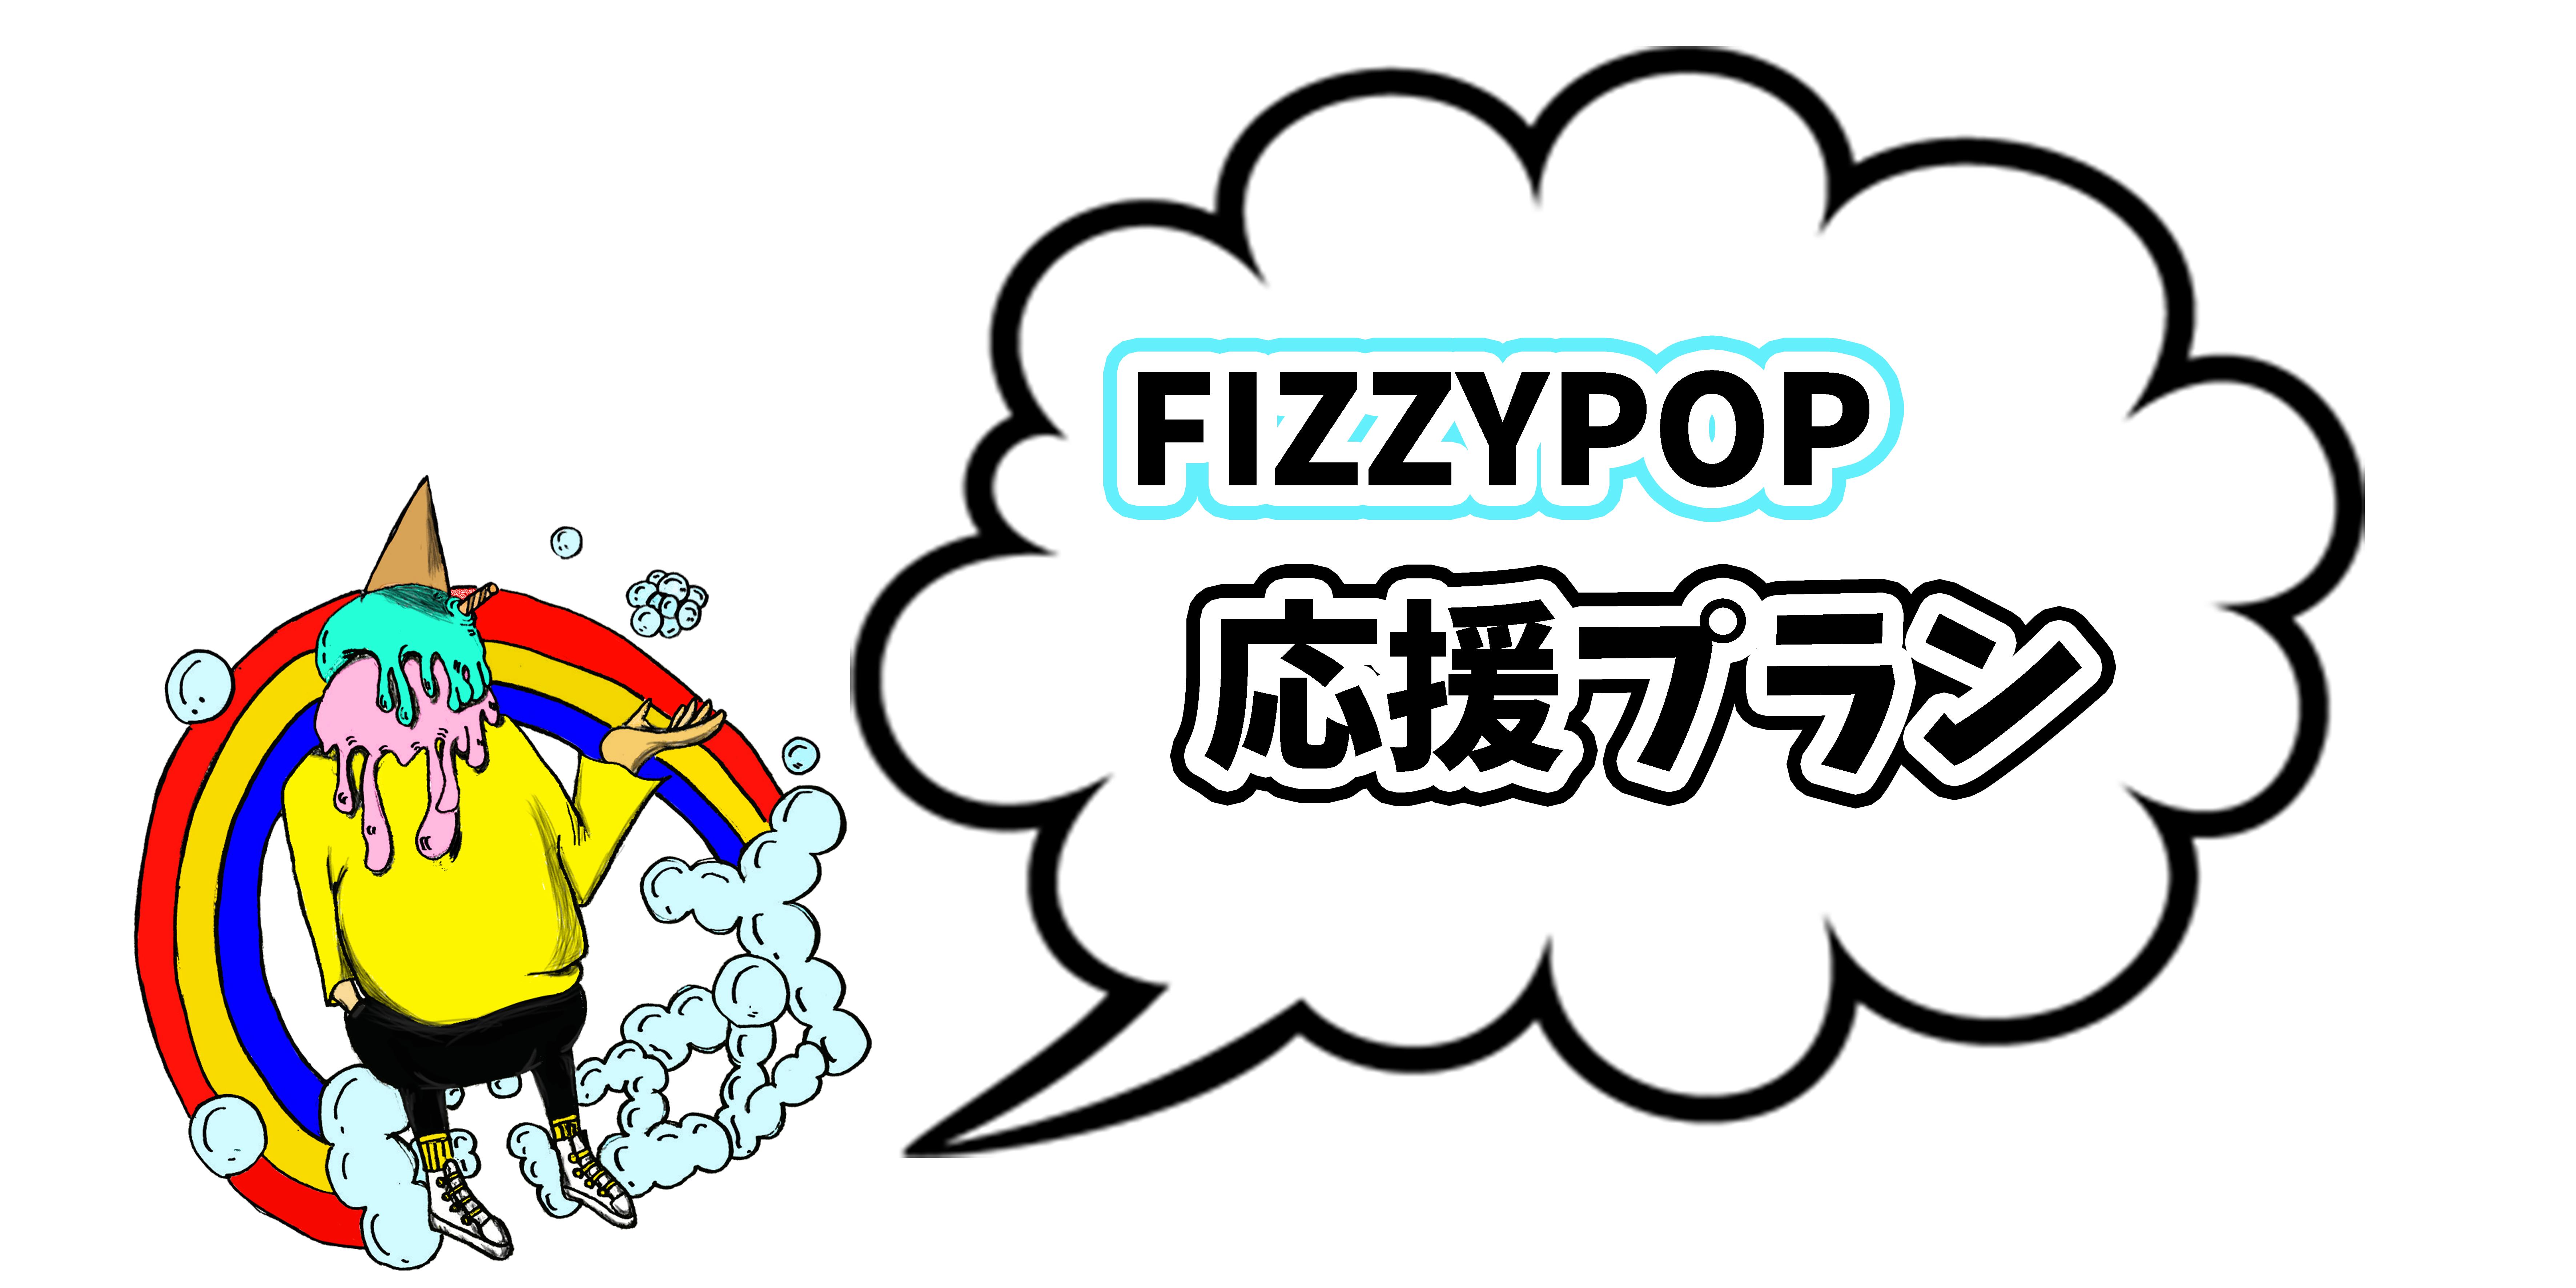 <FIZZY POP 応援 プラン>